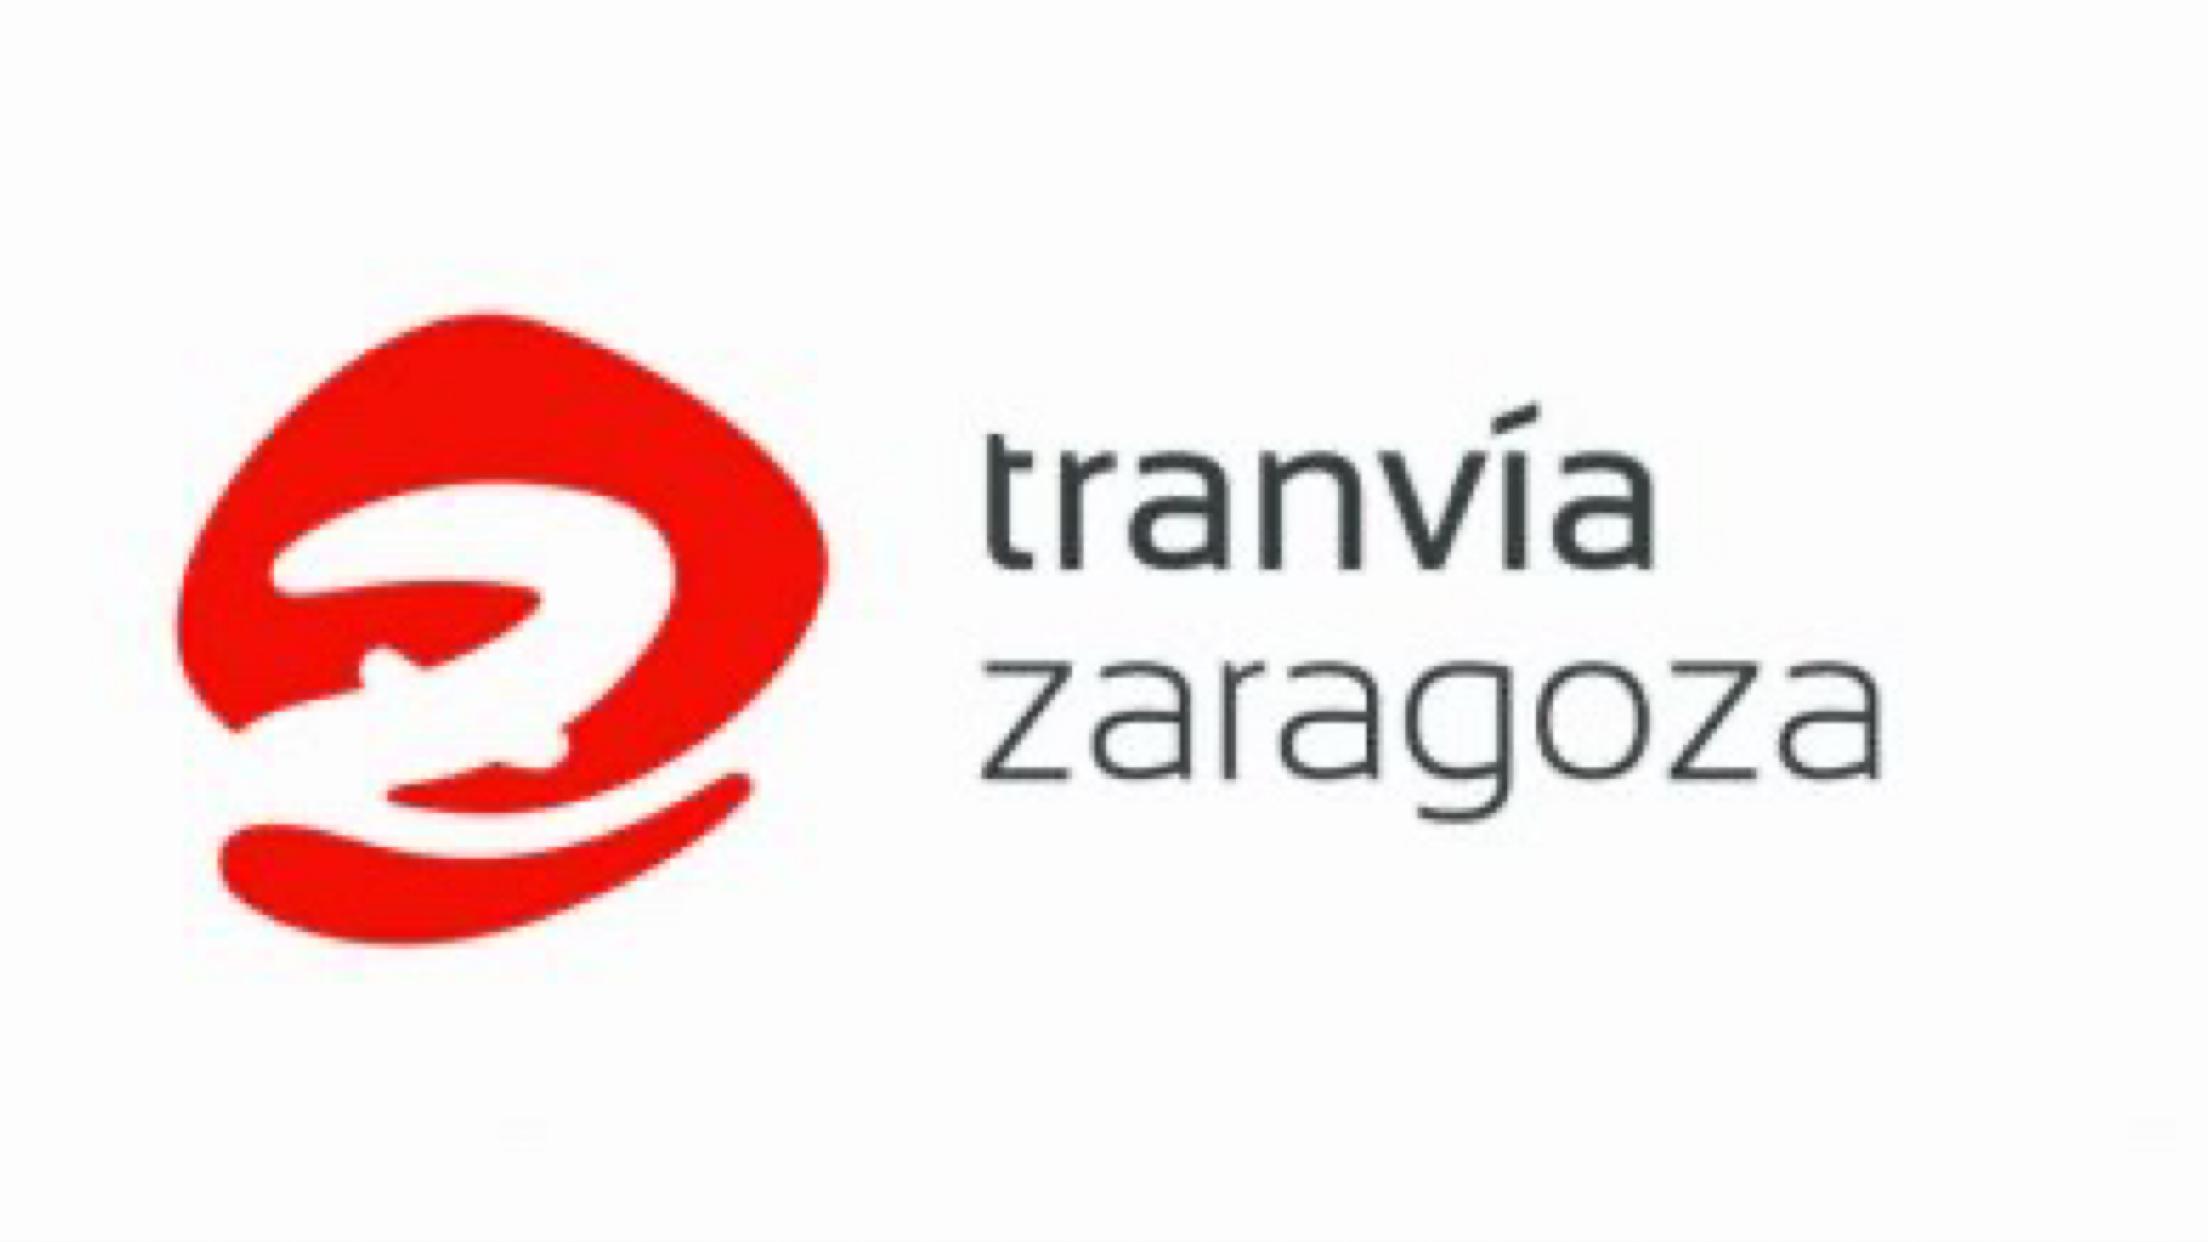 Tranvias-de-Zaragoza